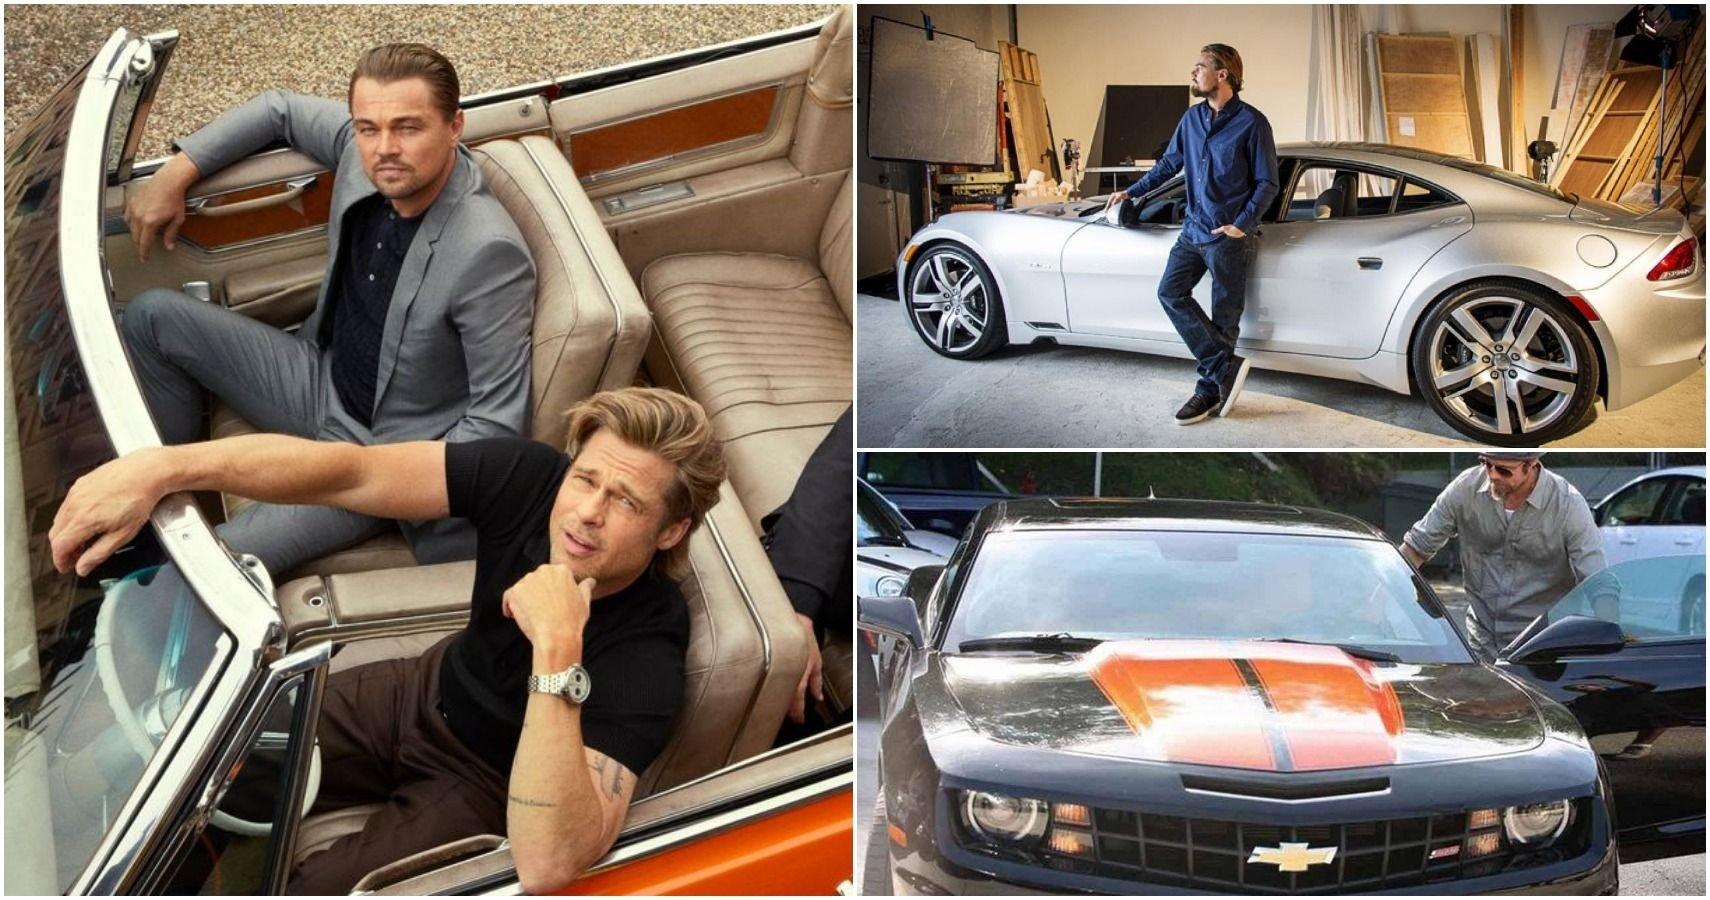 Brad Pitt Vs Leo DiCaprio: Who Drives Better Cars?